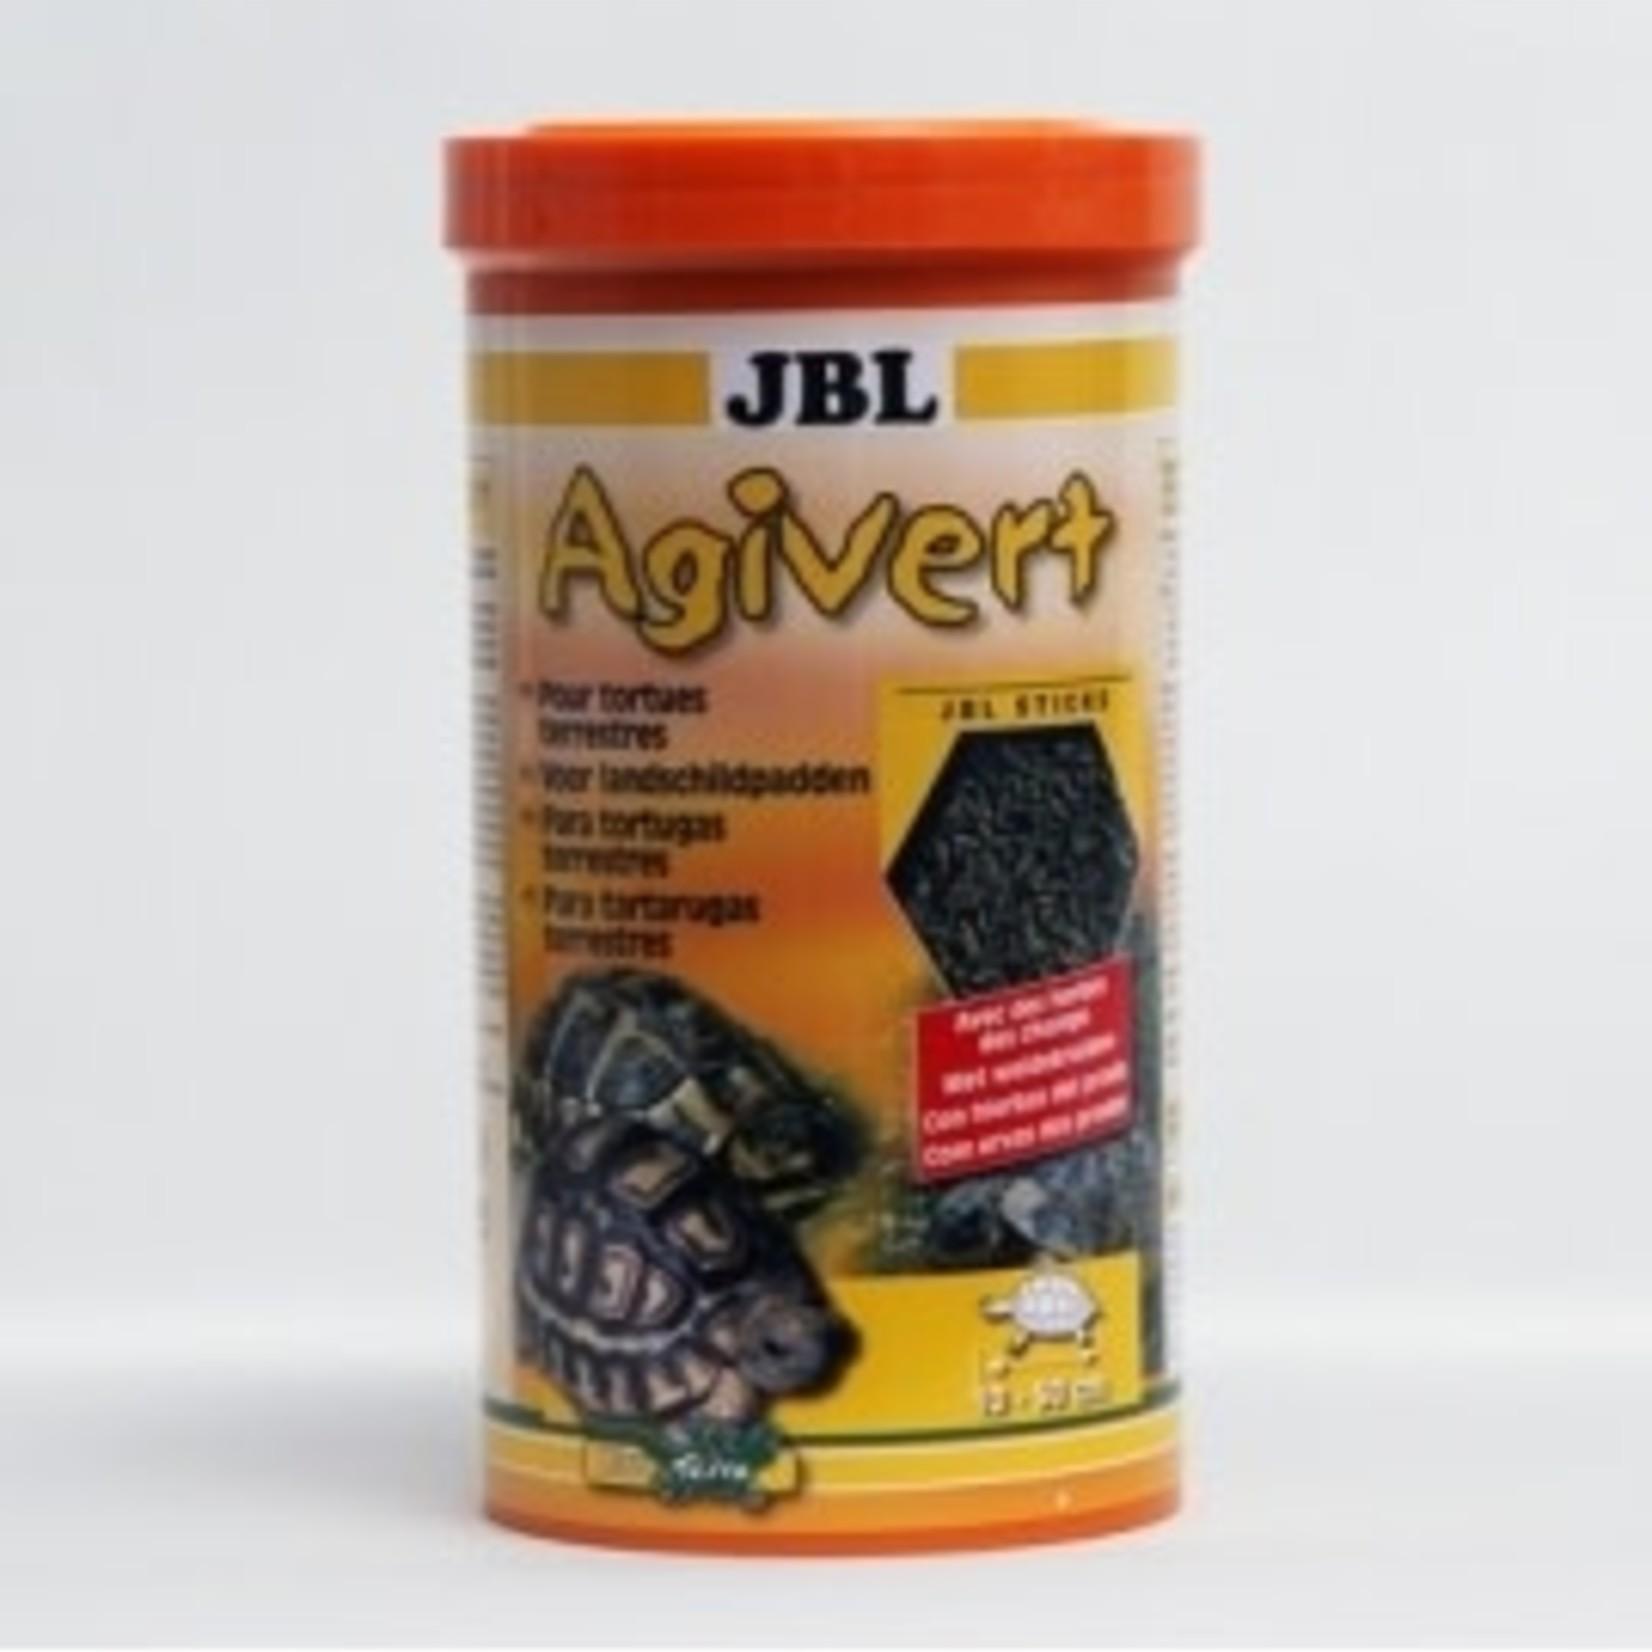 JBL AGIVERT-schildpad